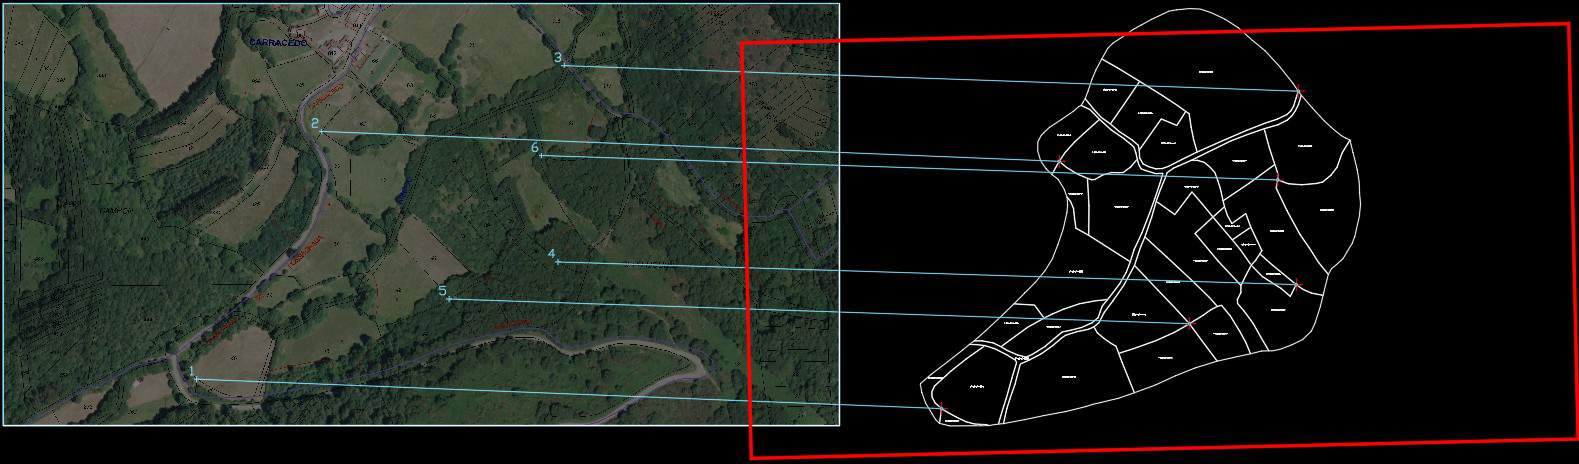 Qué es AutoCAD Map 3D-7